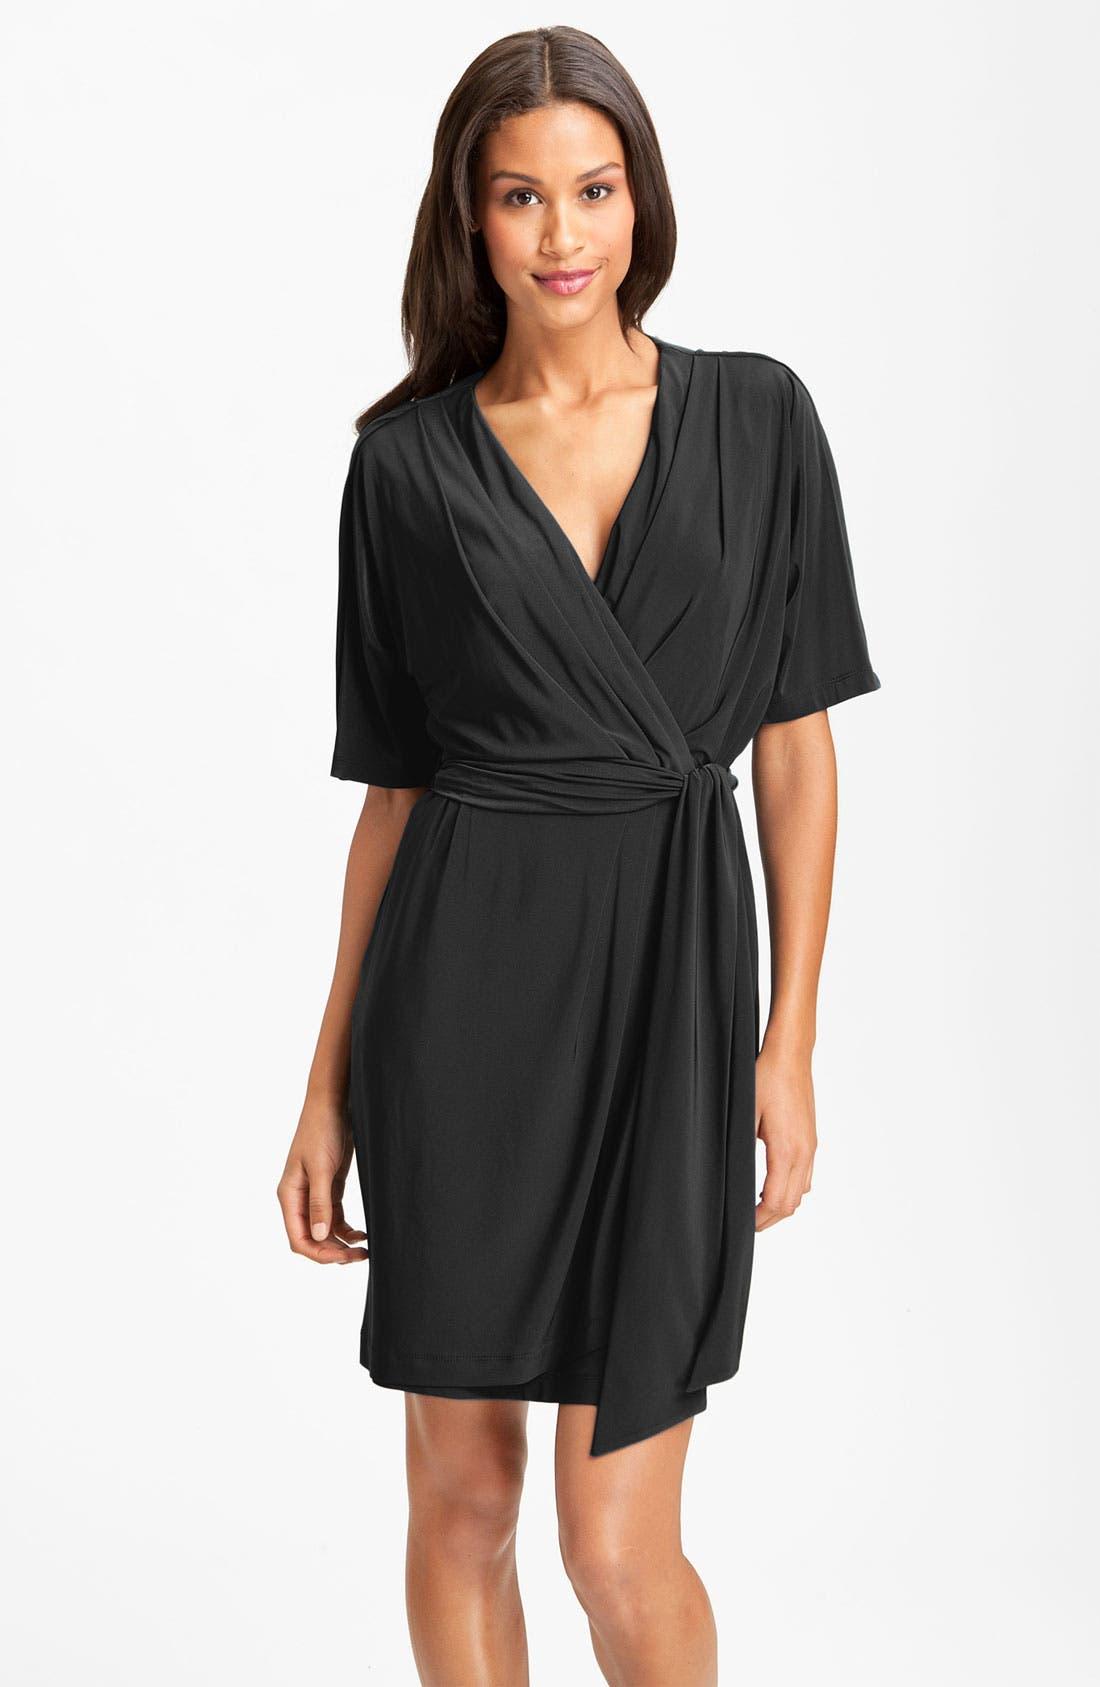 Alternate Image 1 Selected - Eliza J Surplice Jersey Faux Wrap Dress